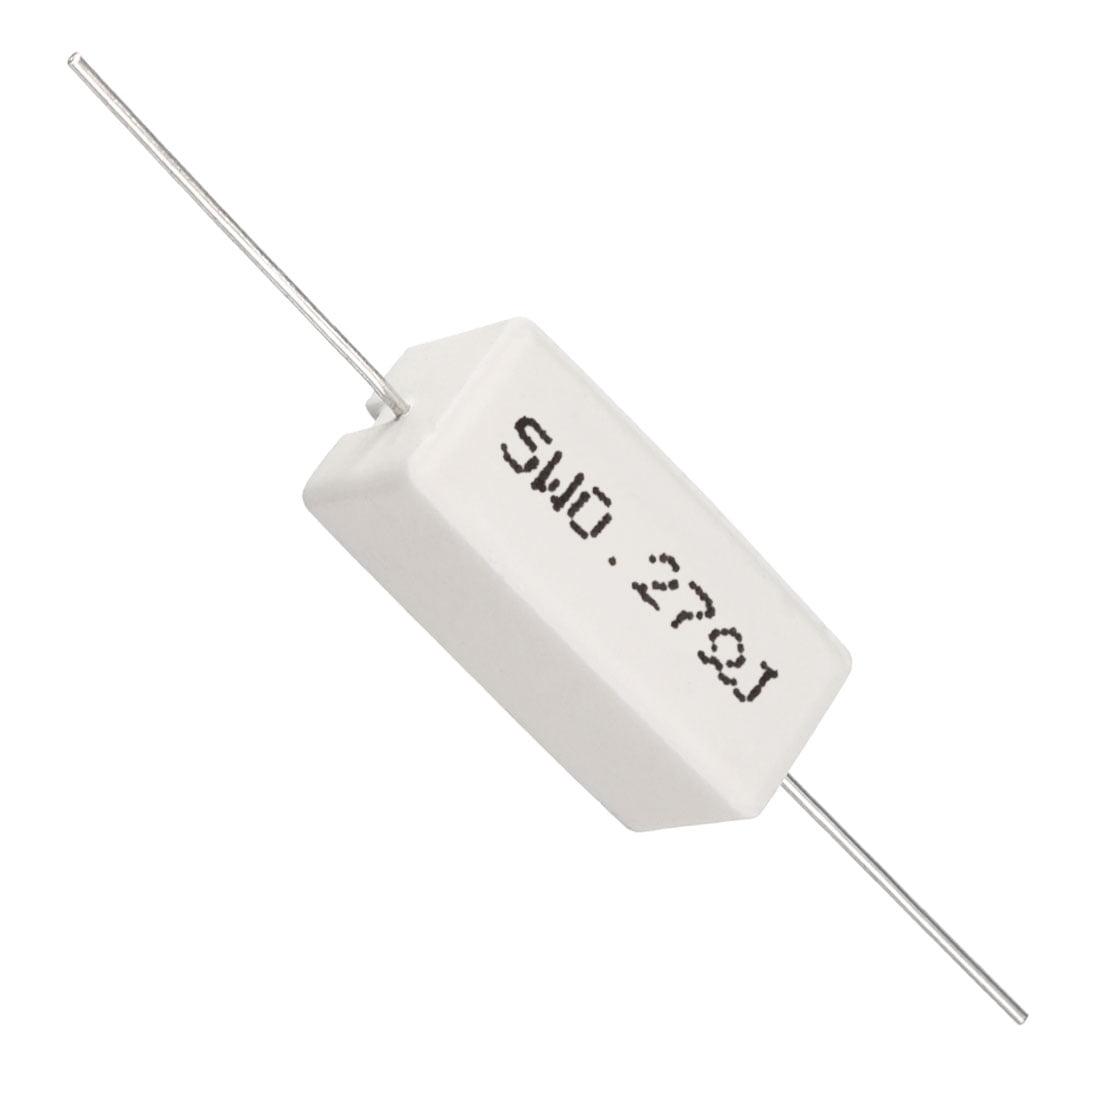 Axial Lead 5W 0.27 Ohm Ceramic Cement Power Resistor White 15 Pcs